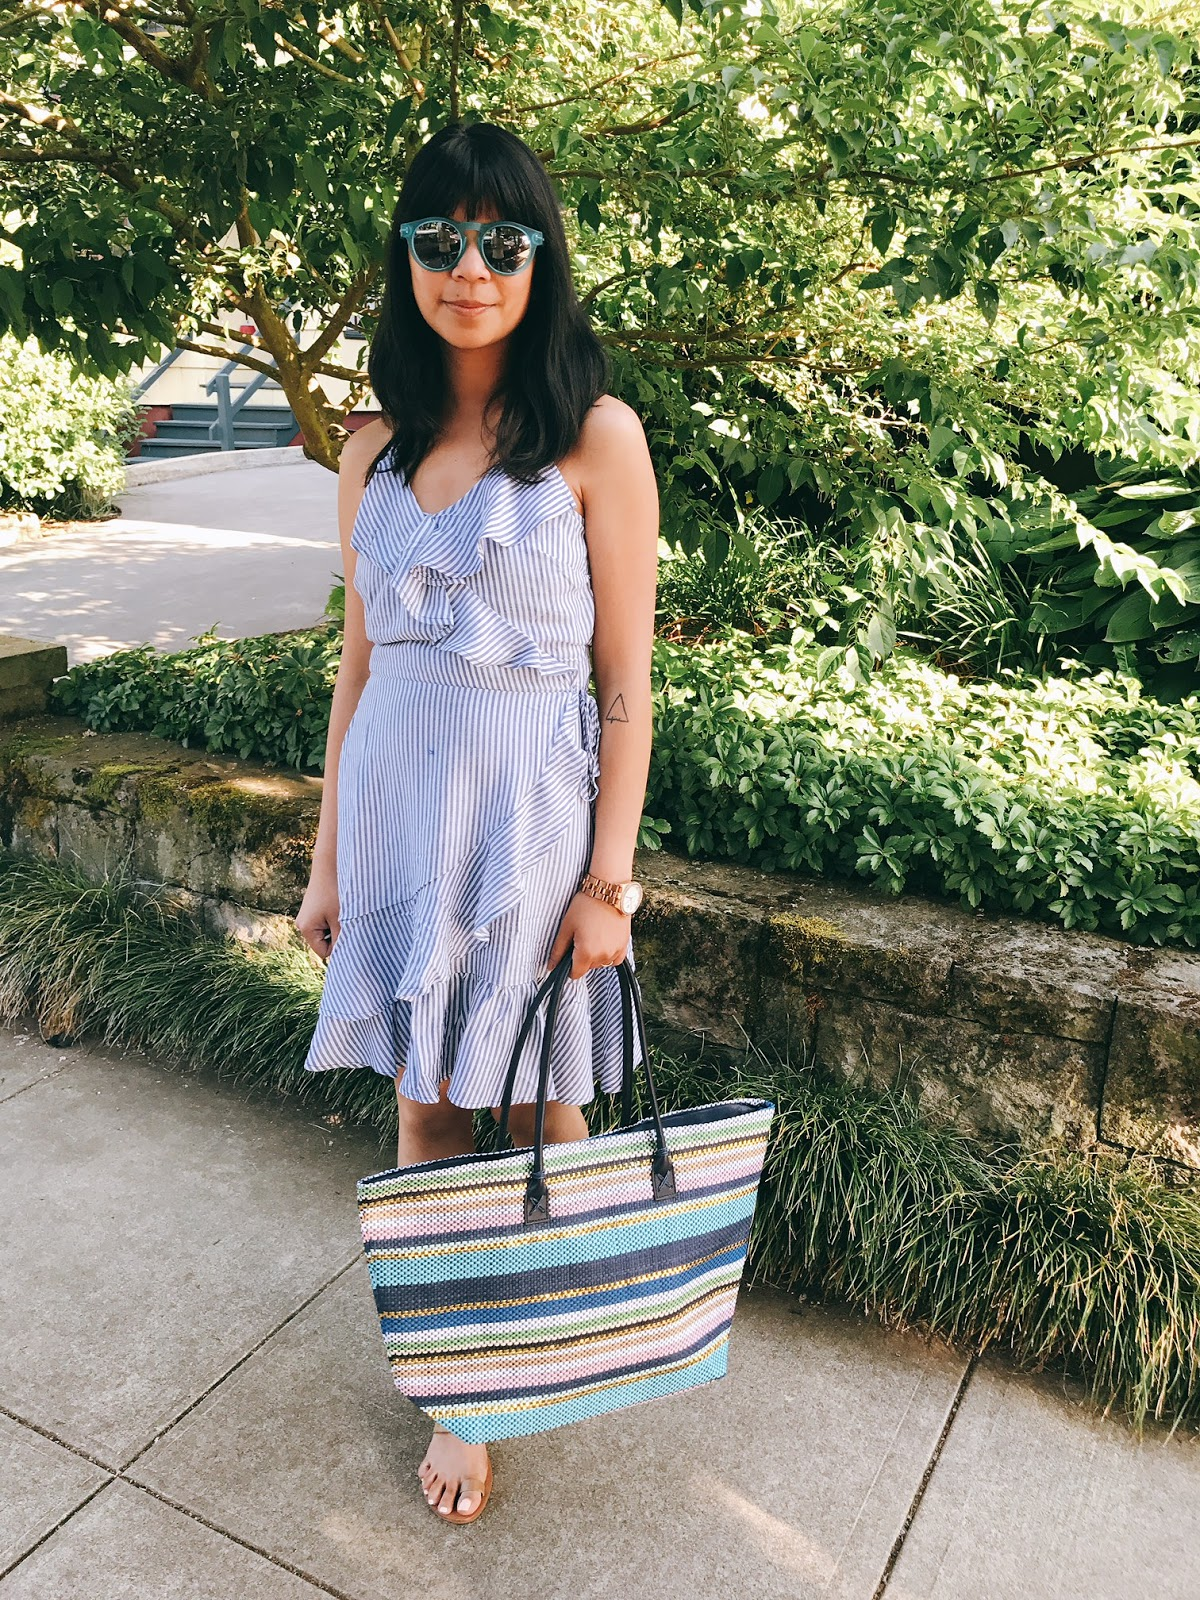 summer outfit, blue striped ruffle dress, nude strappy sandals, blue sunglasses, straw bag, birkin straw bag, jane birkin, the story of, portland fashion blogger, ptowngirls,